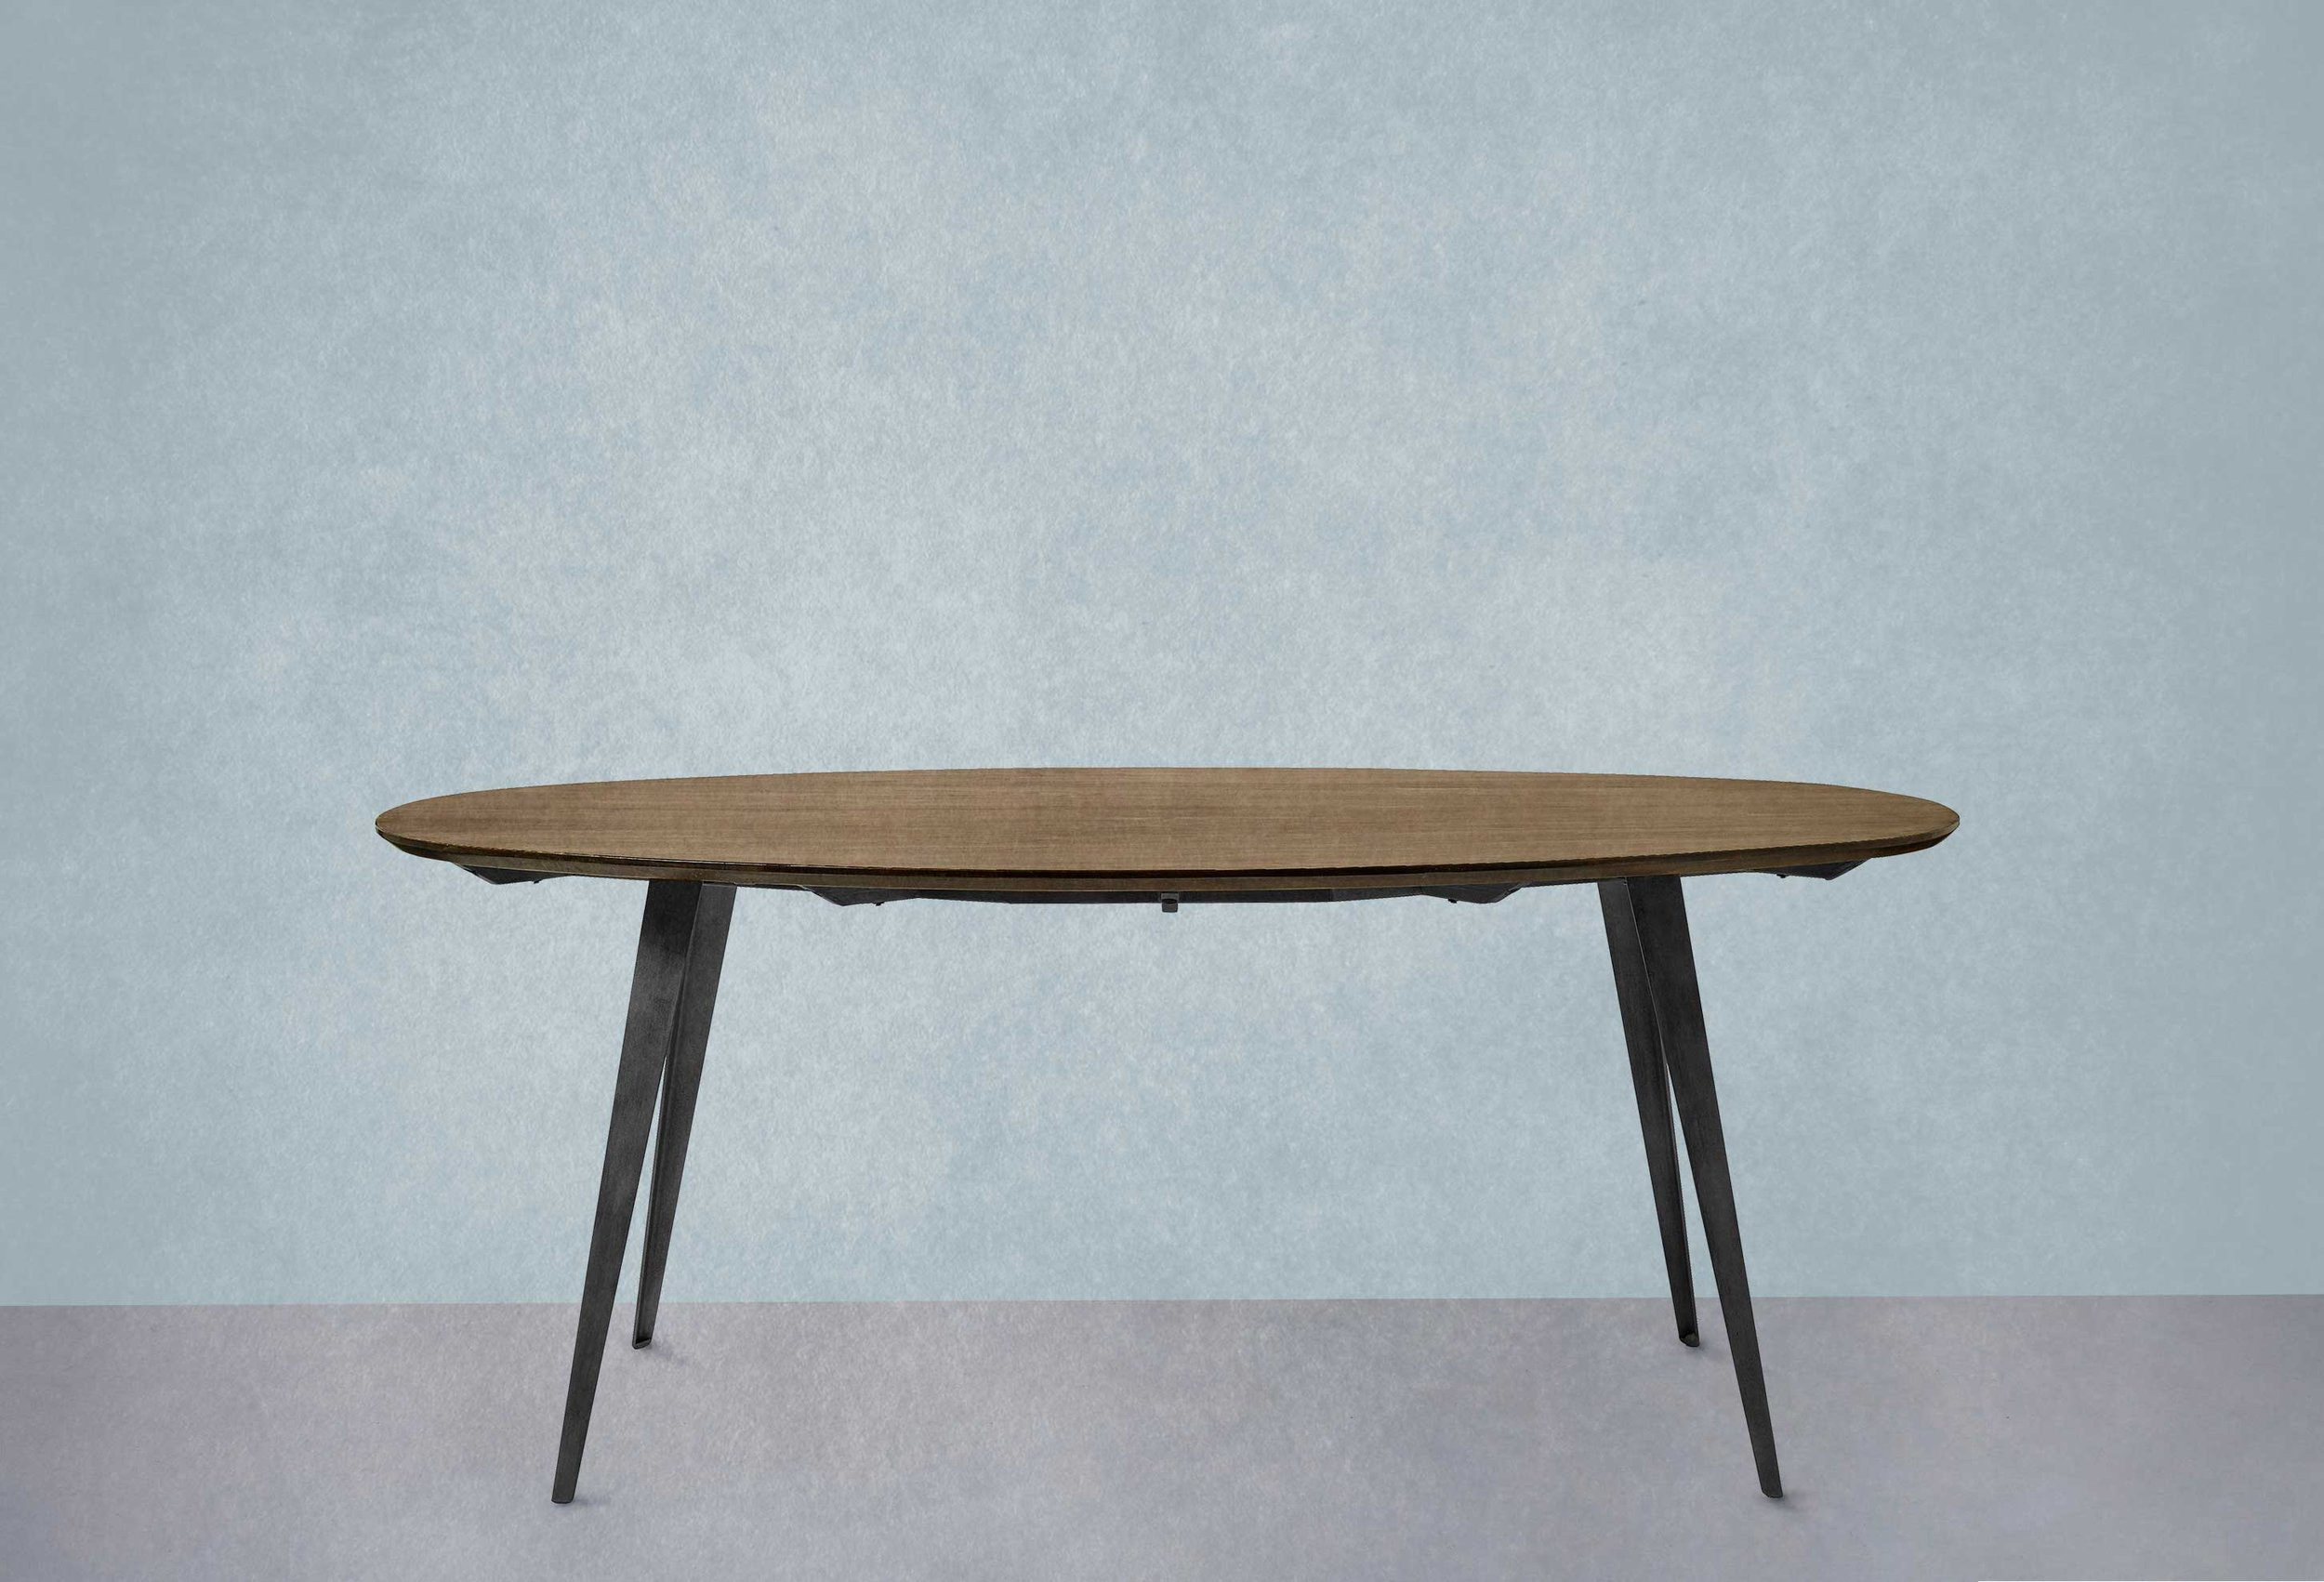 _nordal_table_LE_MILE_Magazine_LE_MILE_SeLECTED_European_Furniture_Design_2018.jpg